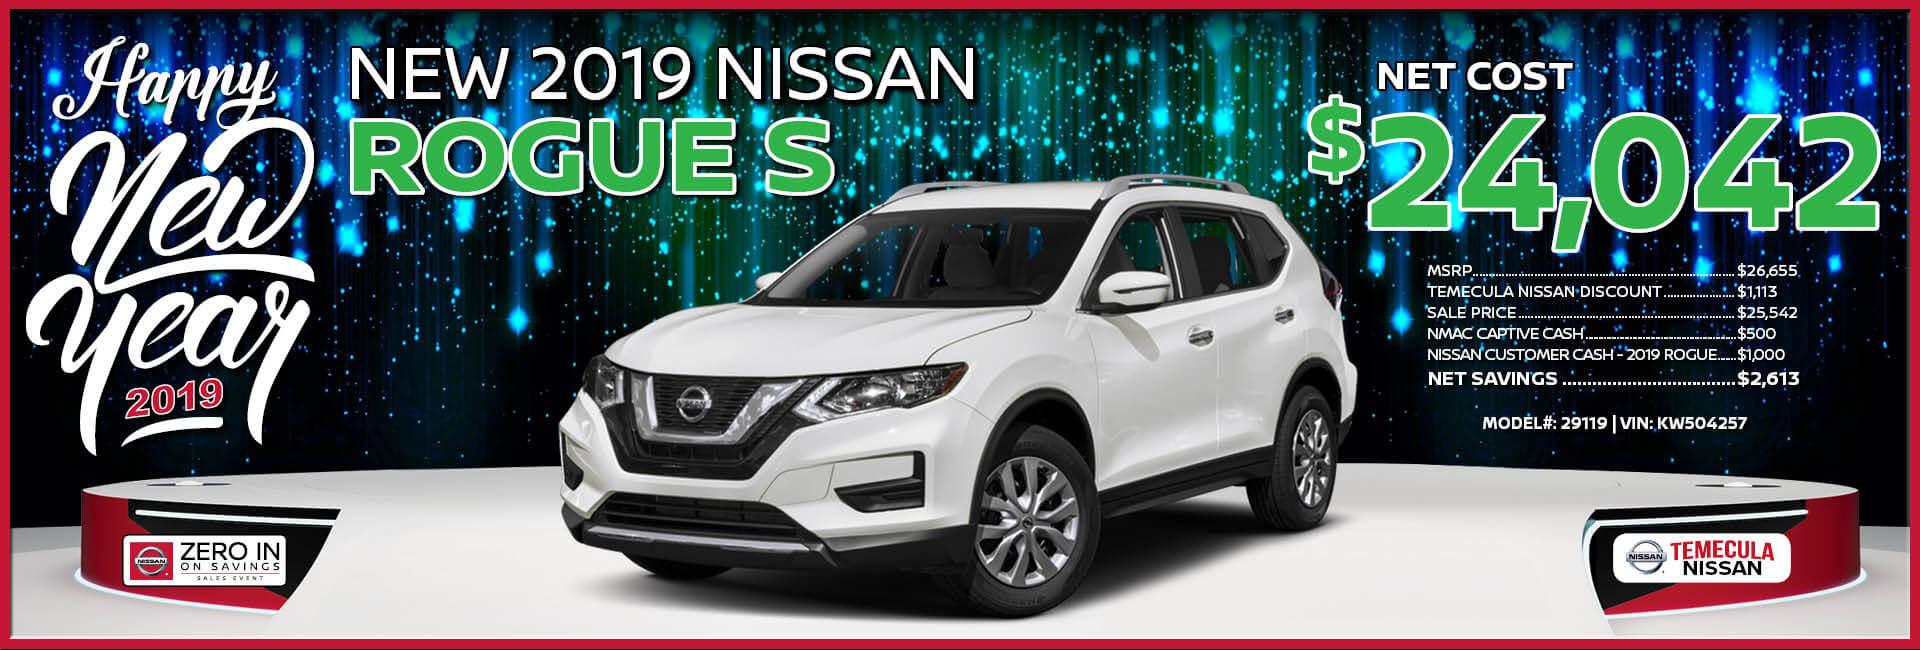 Nissan Rogue $24,042